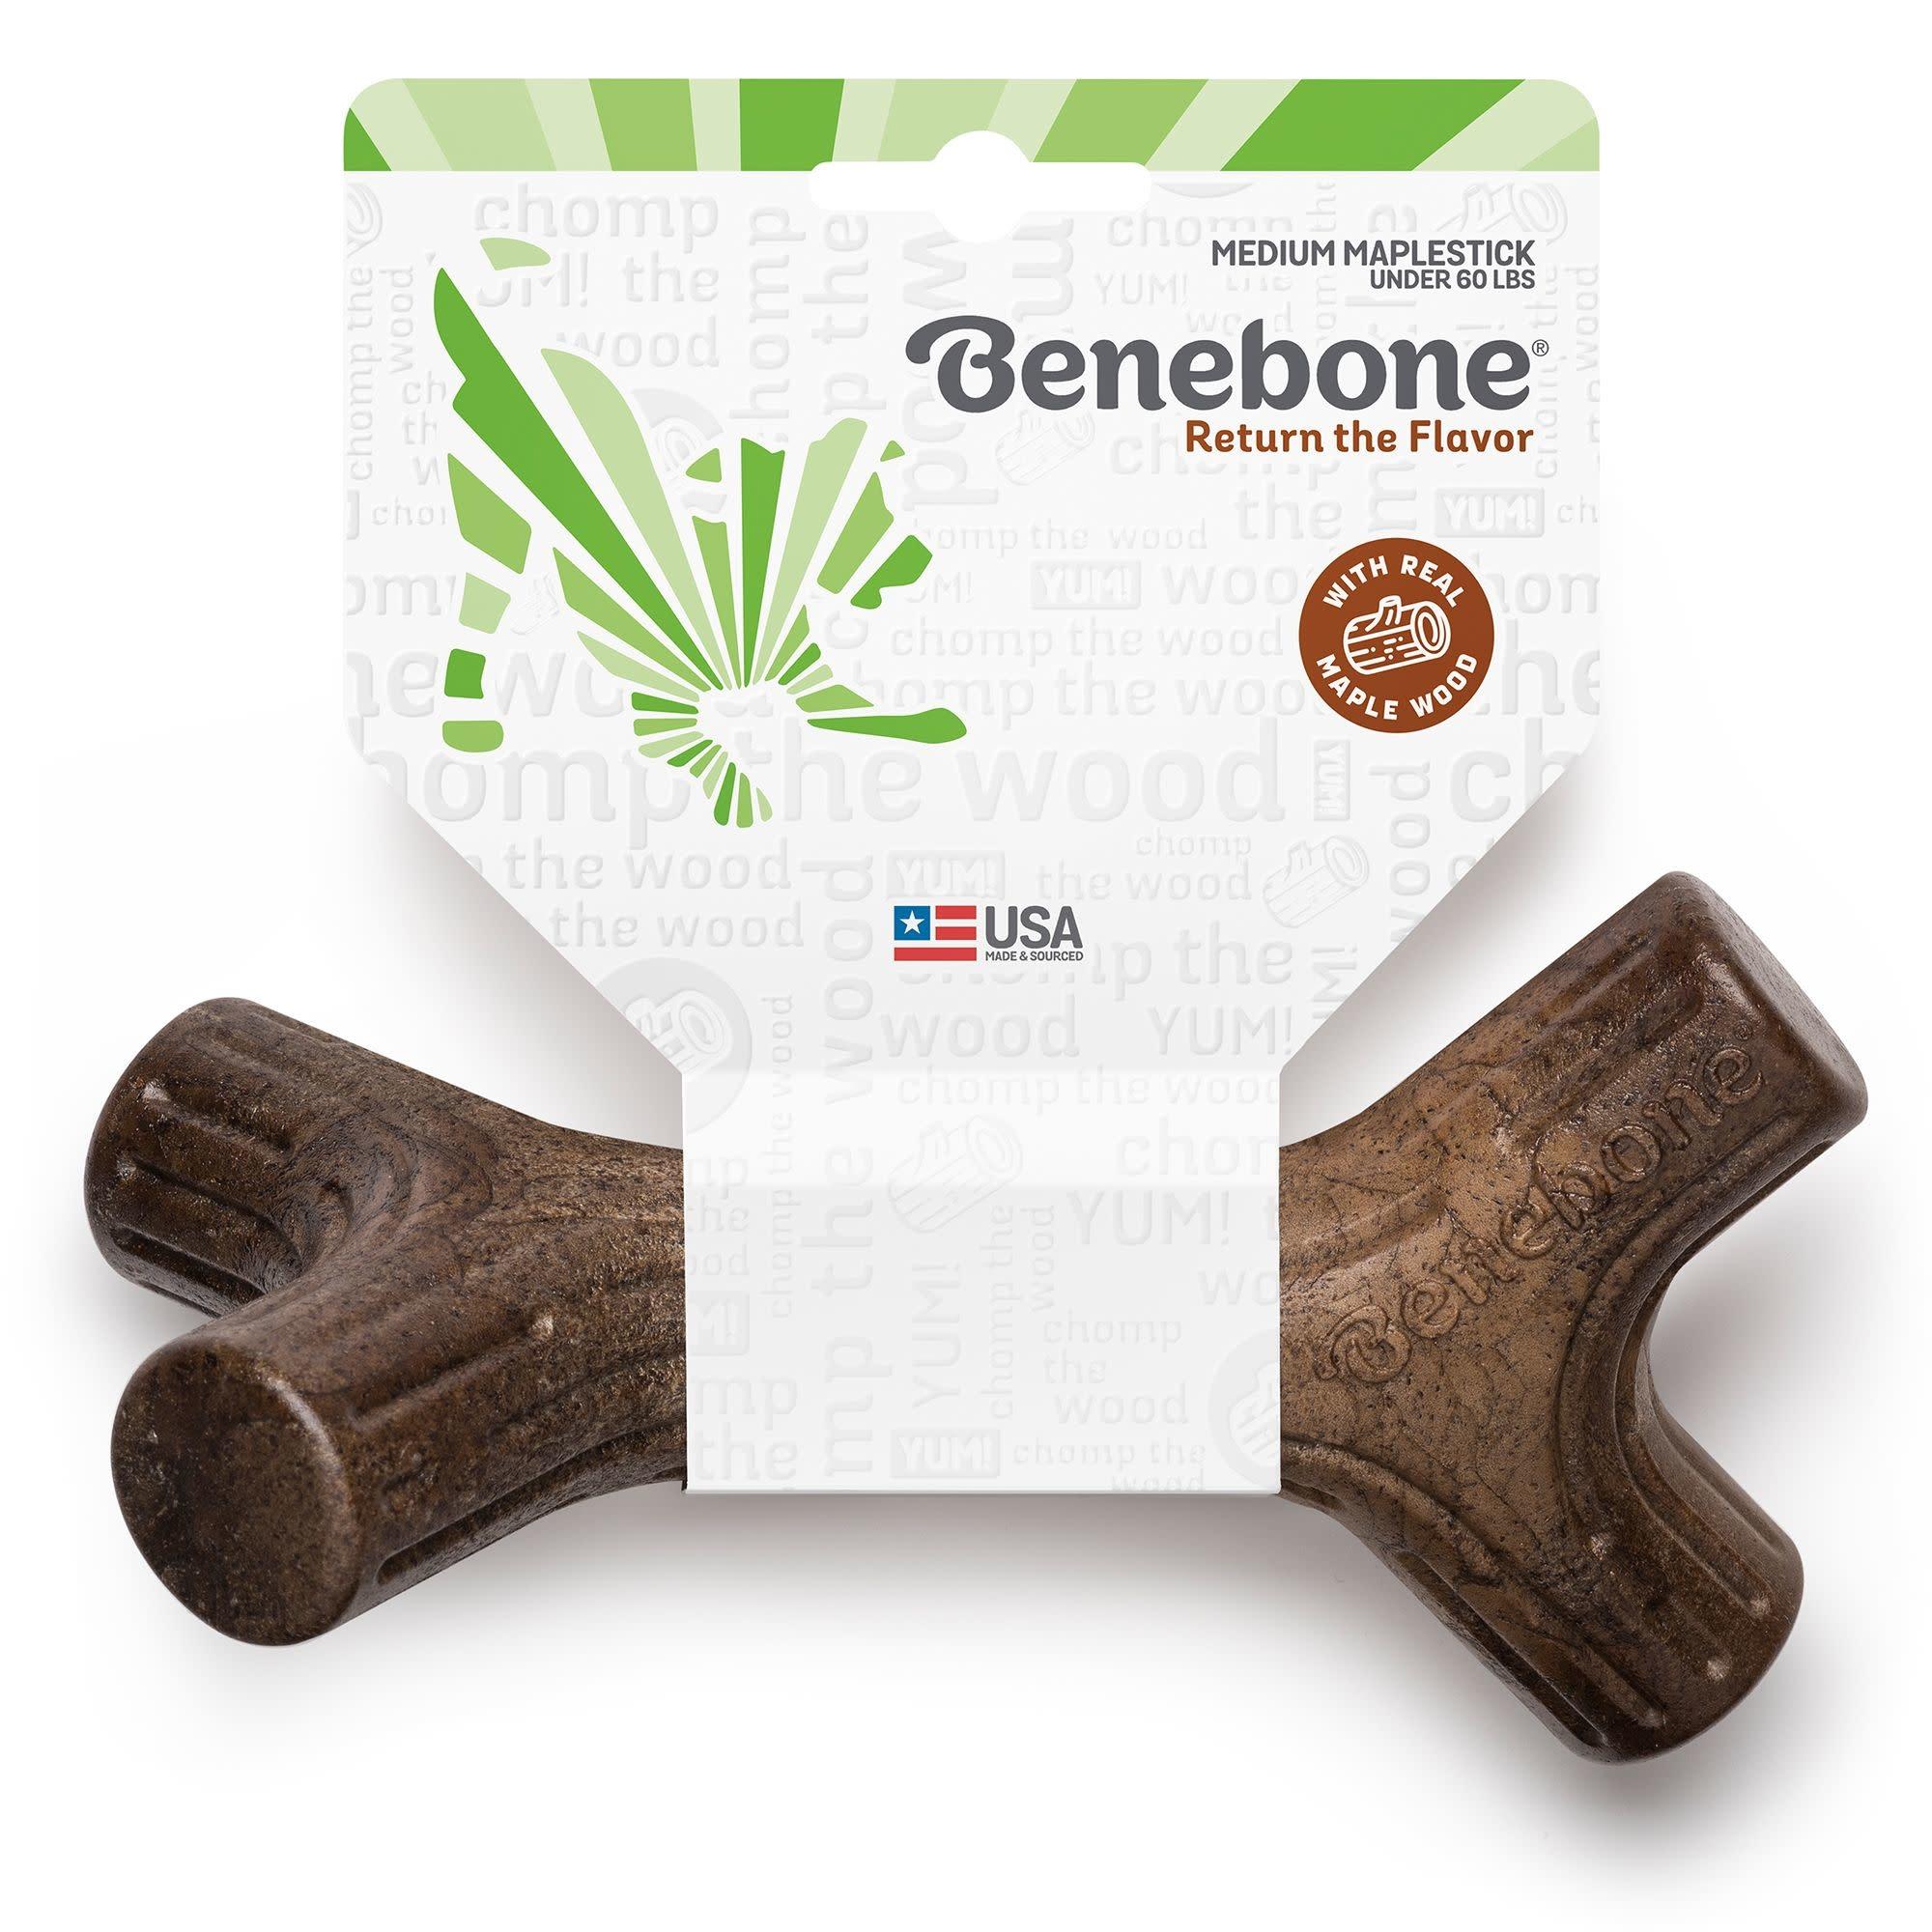 Benebone Benebone Maplestick Medium